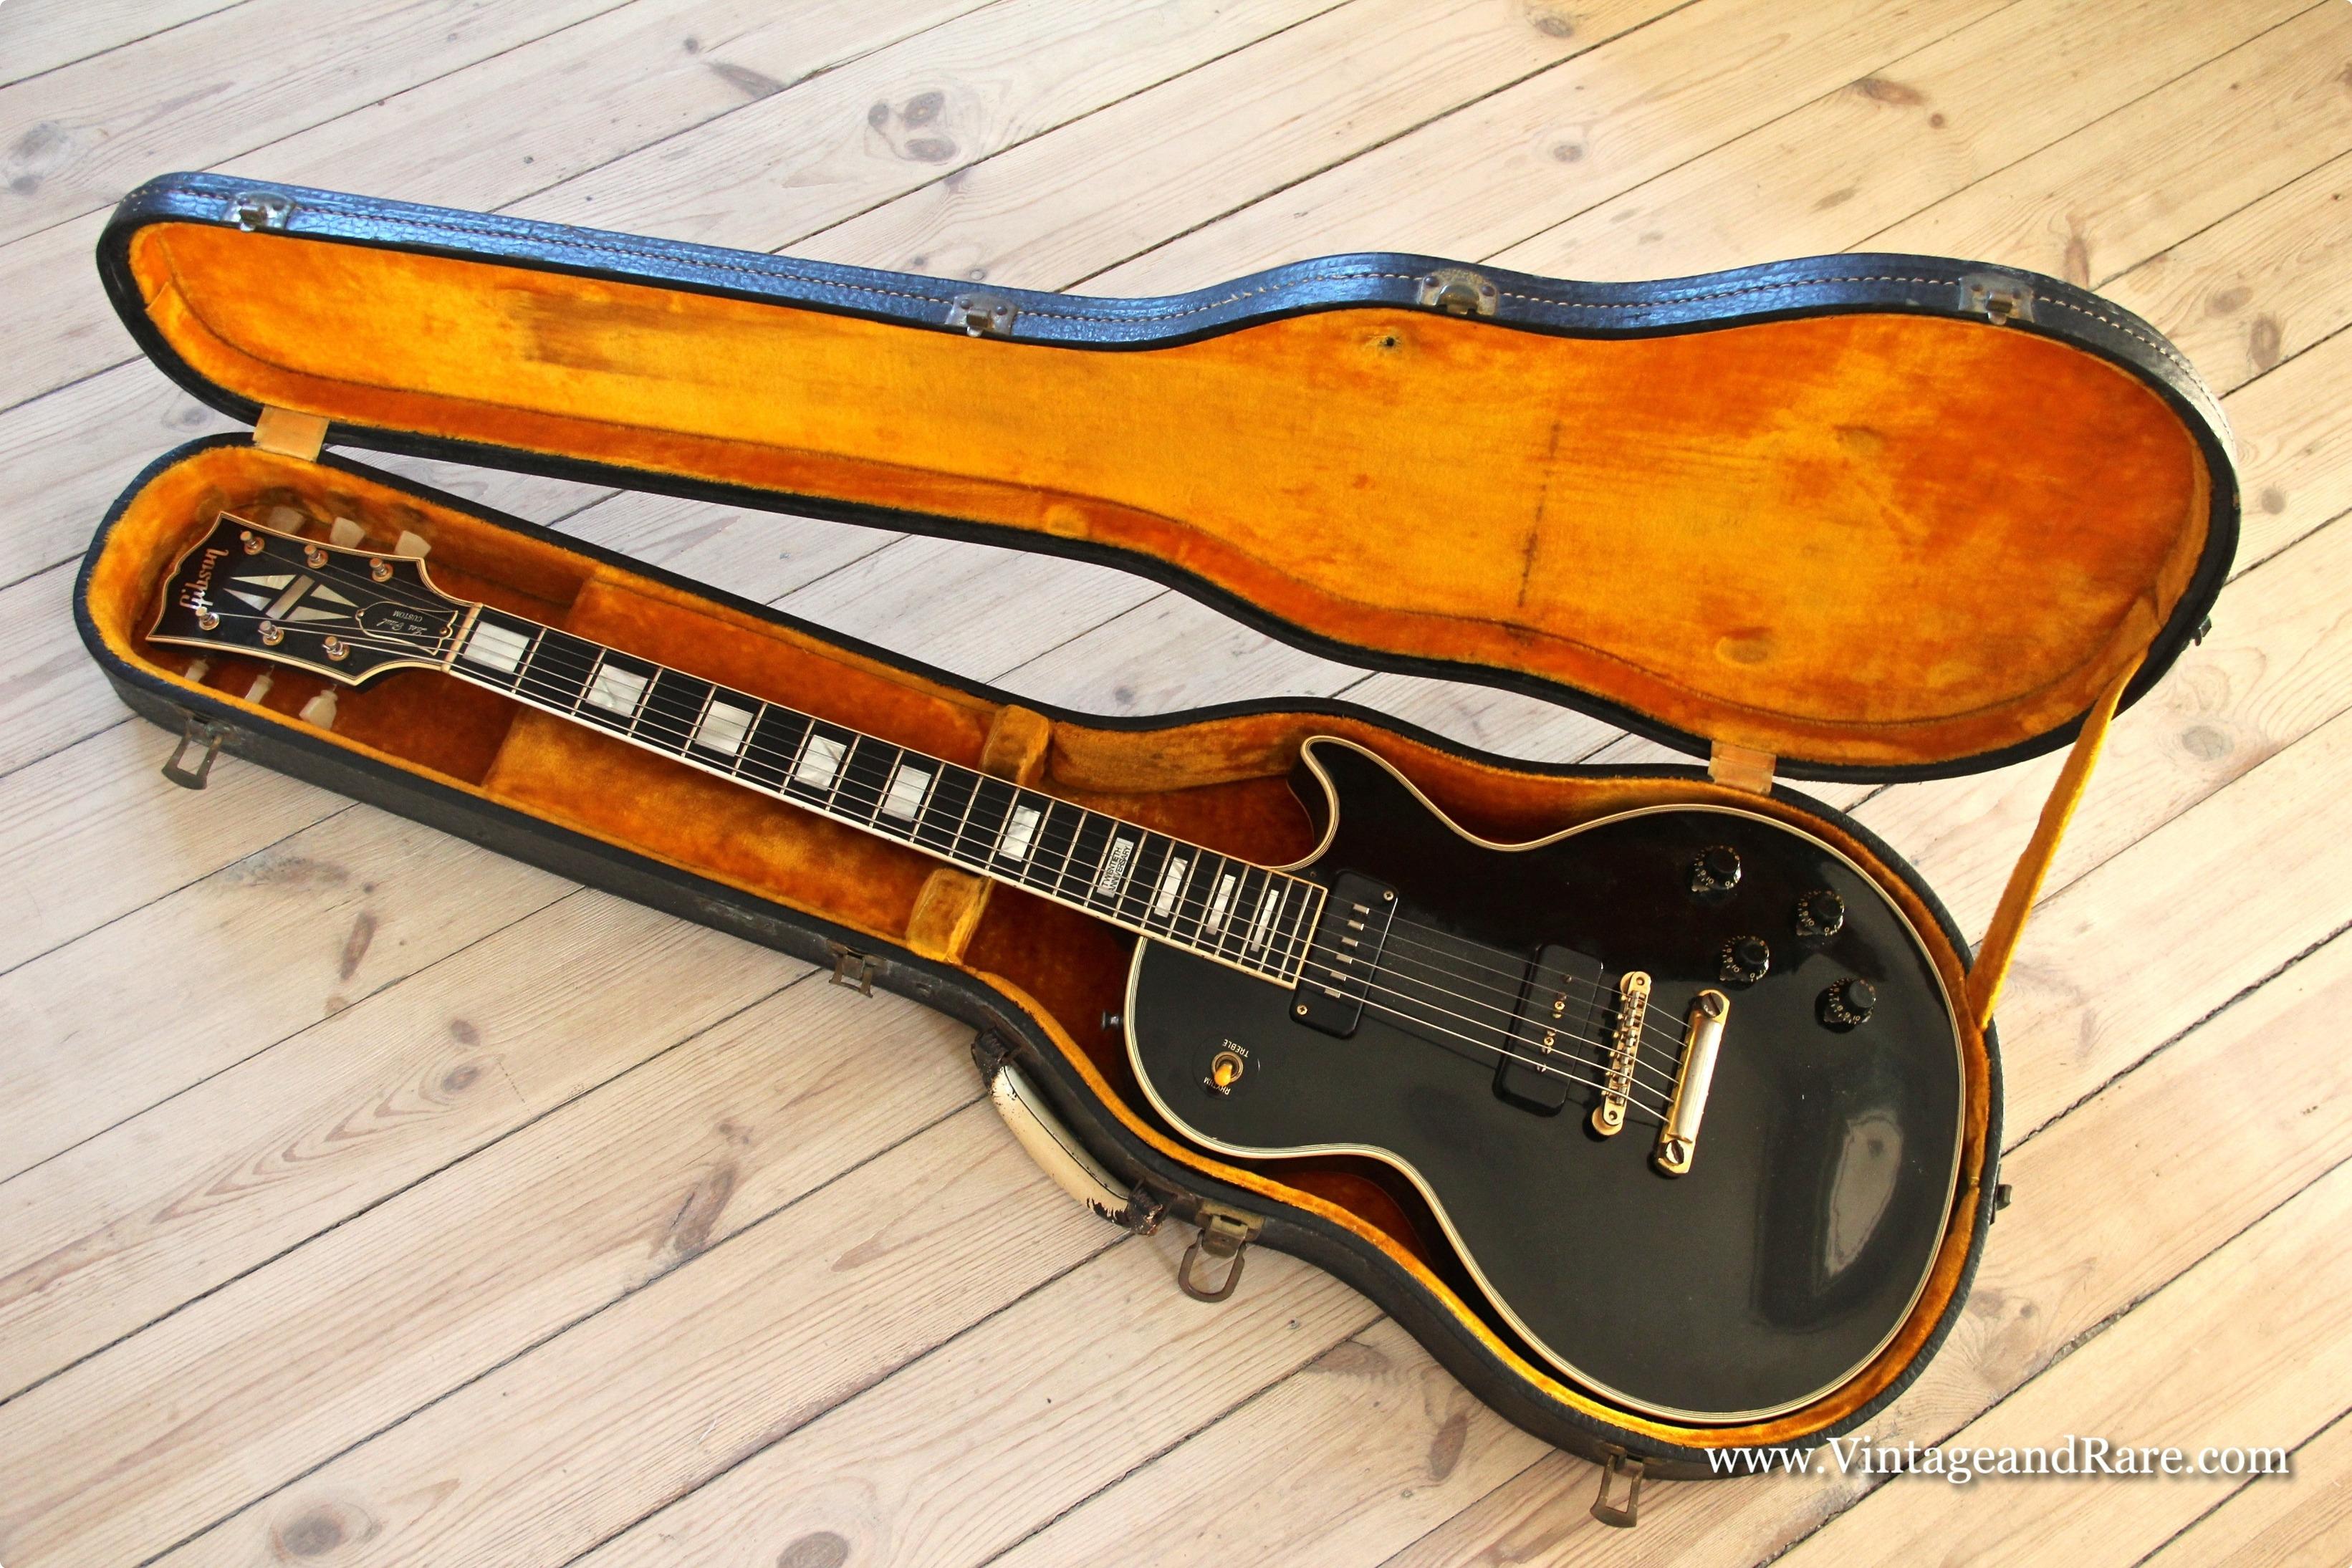 gibson les paul custom 1957 black beauty guitar for sale. Black Bedroom Furniture Sets. Home Design Ideas